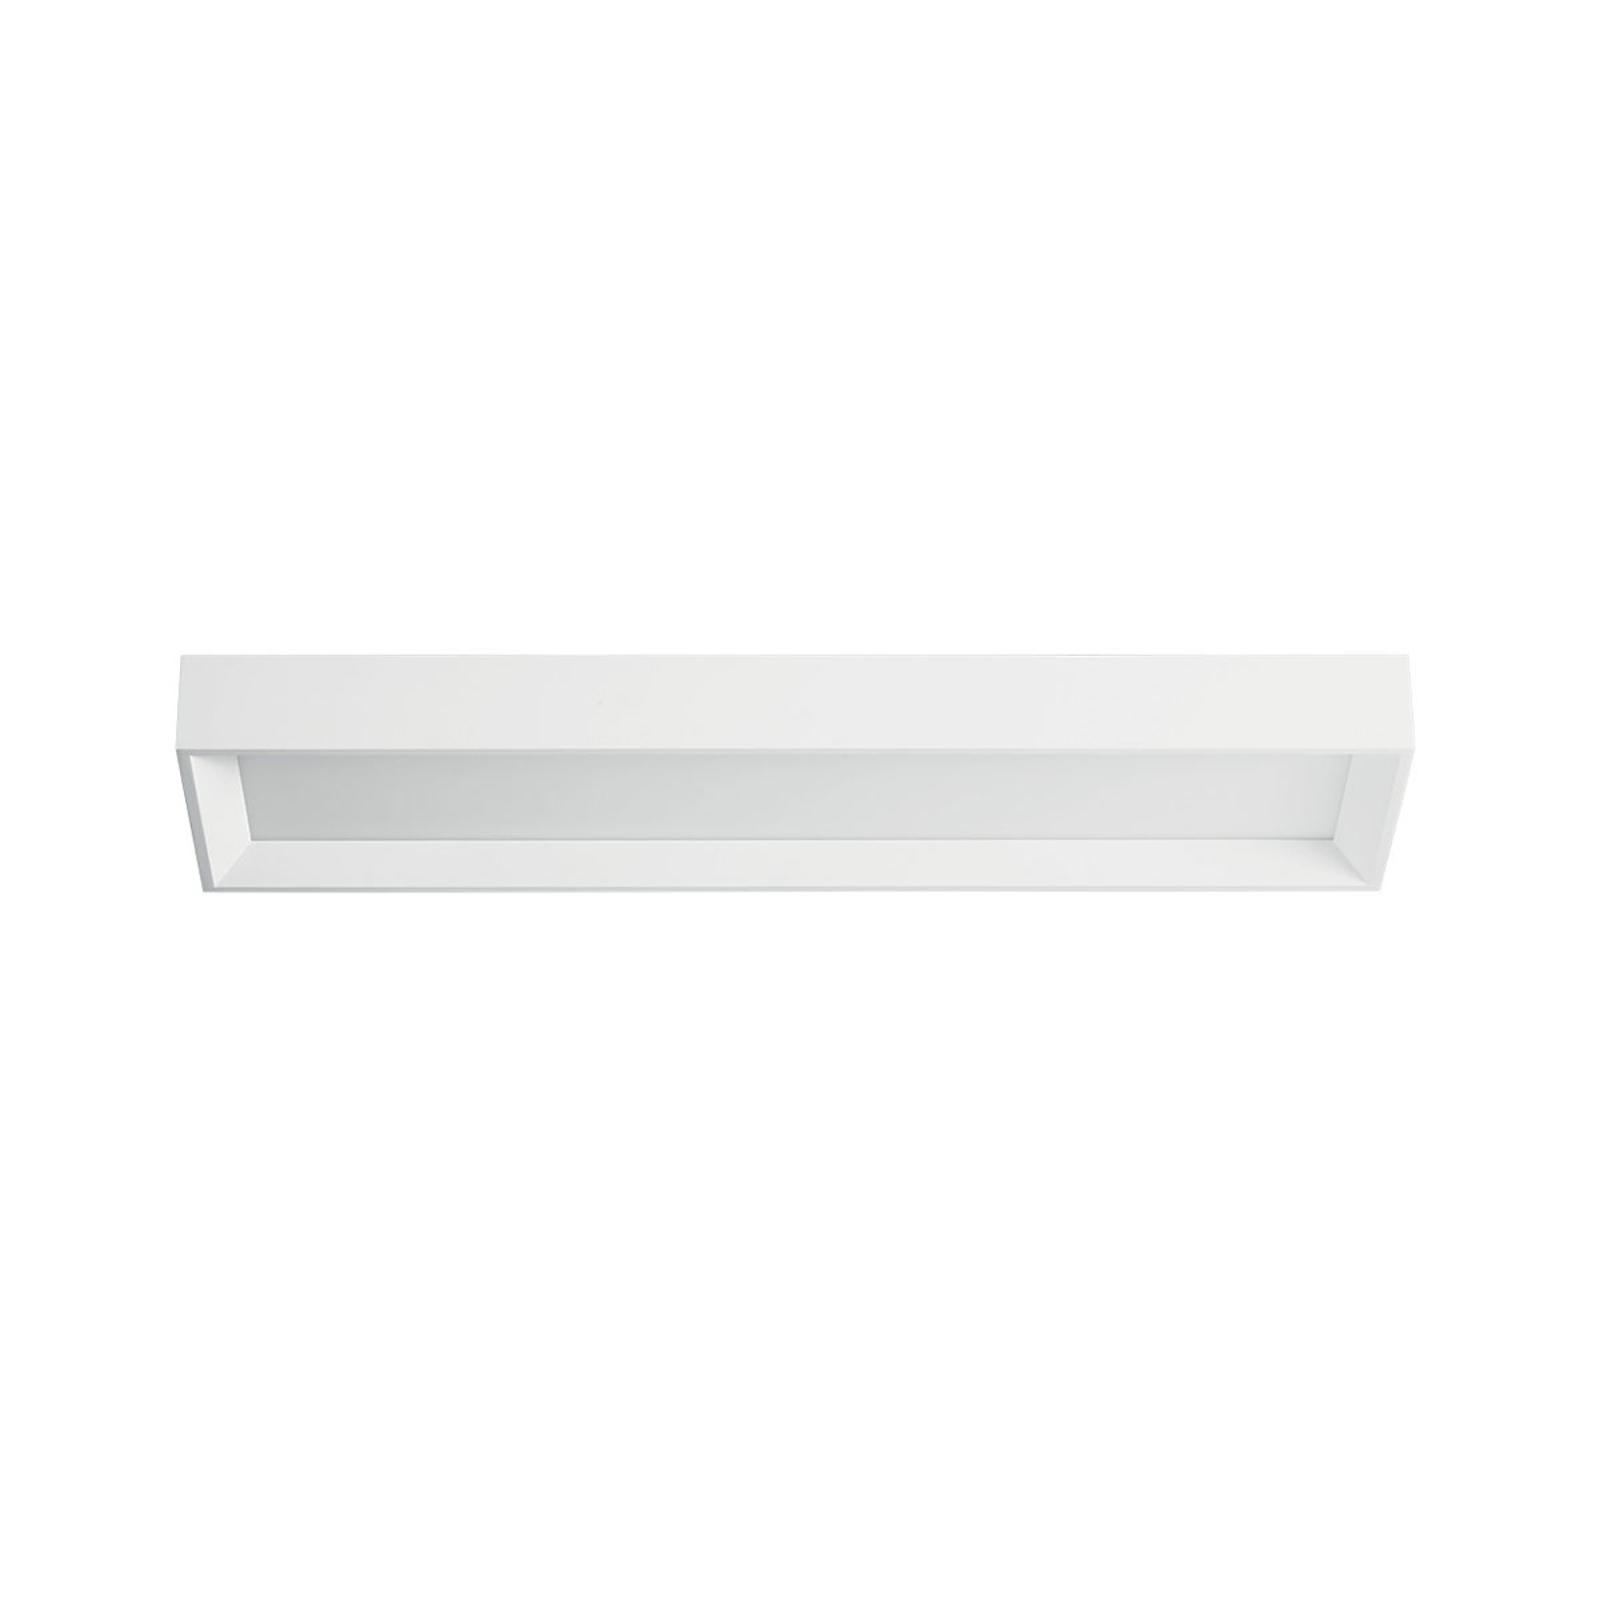 Lampa sufitowa LED Tara dimmable, 74 cm x 19 cm